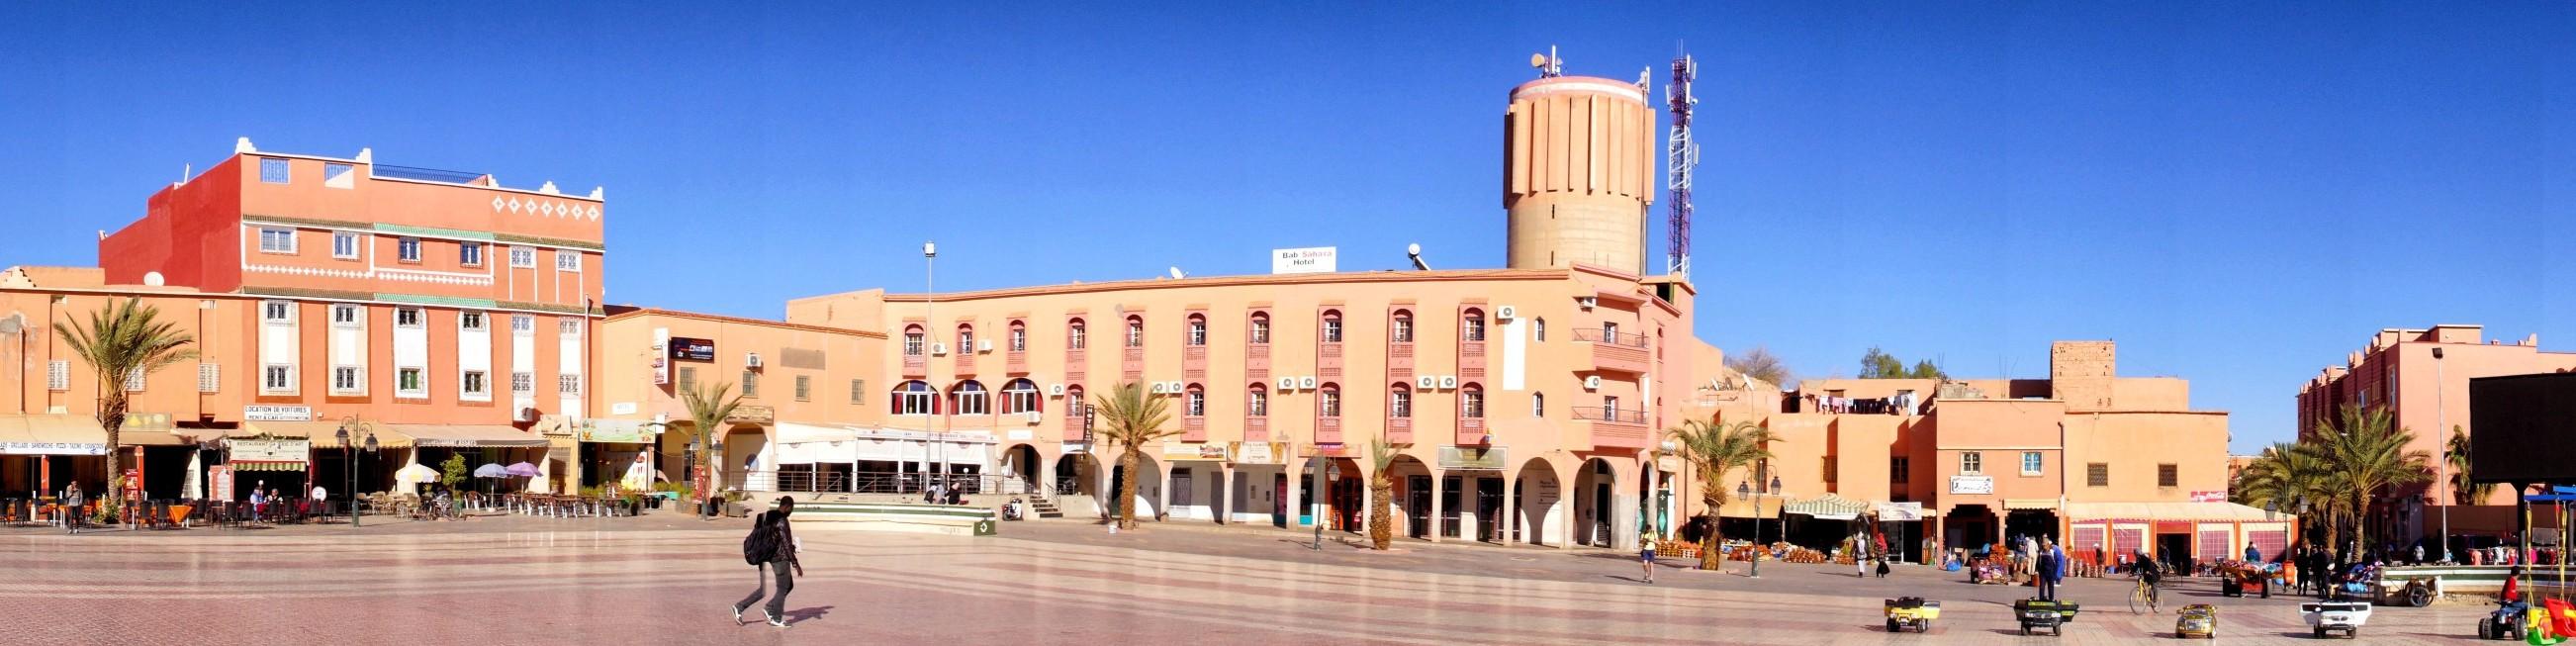 Place al-Mouahidine, czyli serce Ourzazate